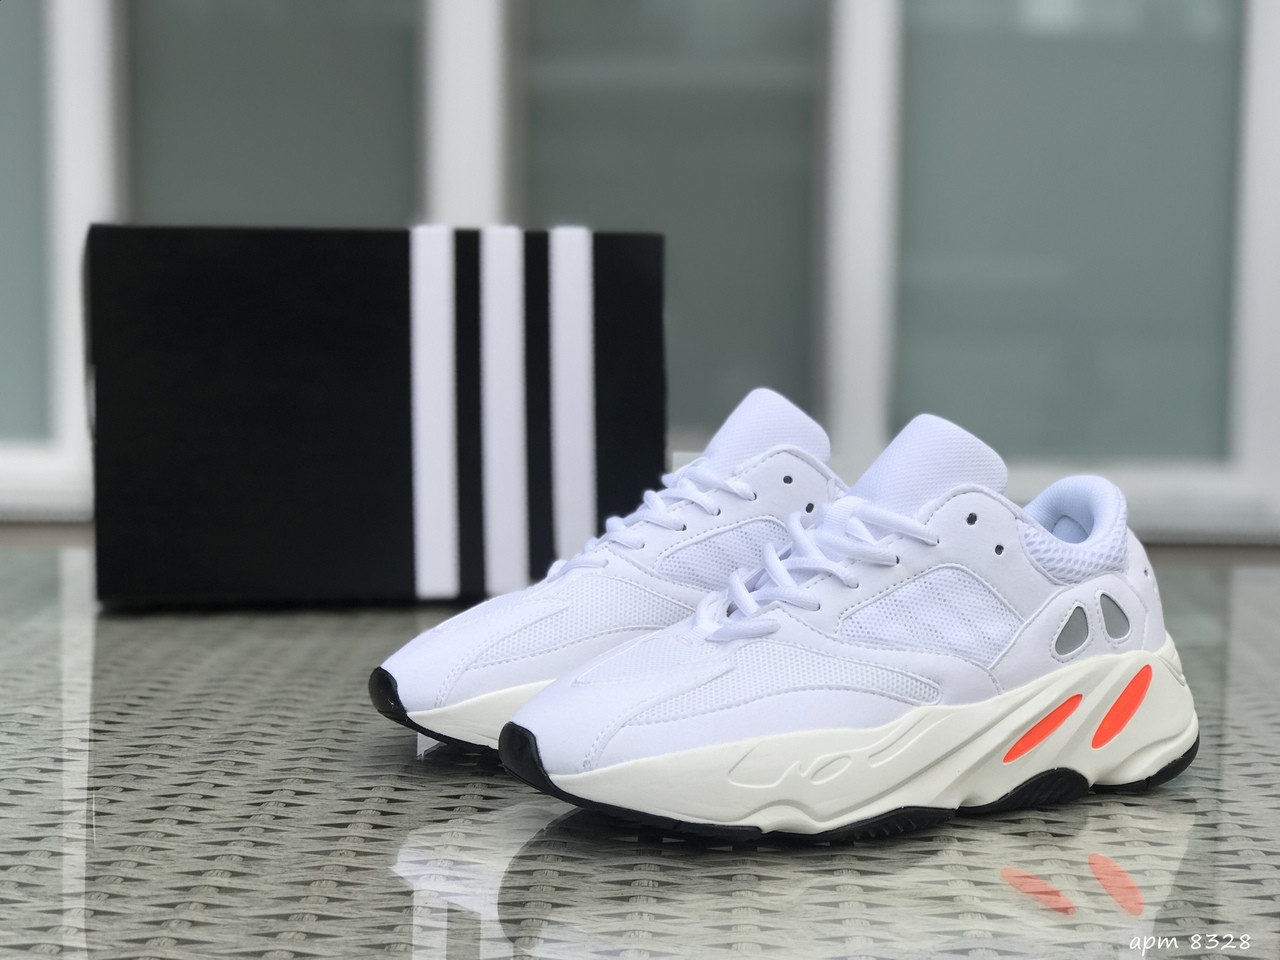 Кроссовки Adidas Yeezy Boost 700 (белые) Унисекс